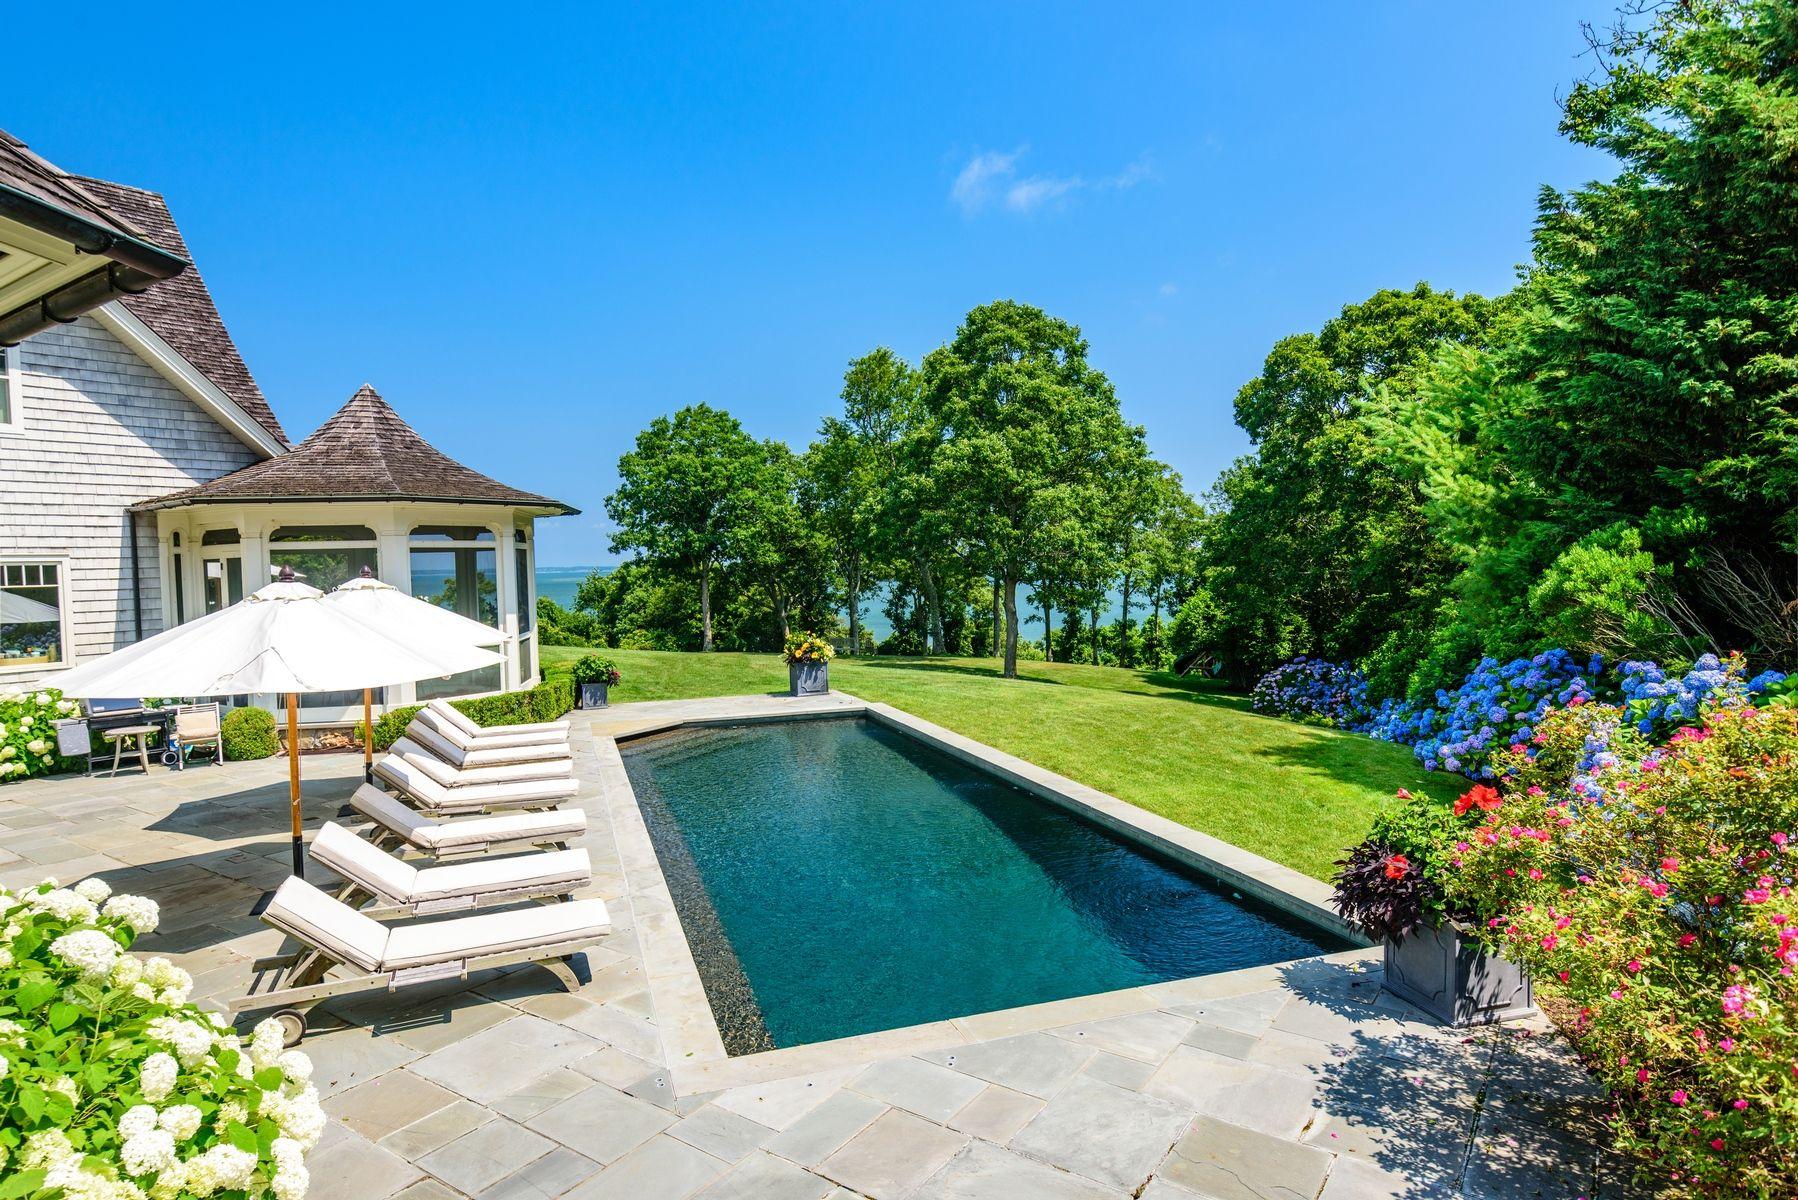 harvey weinstein lists hamptons home pool